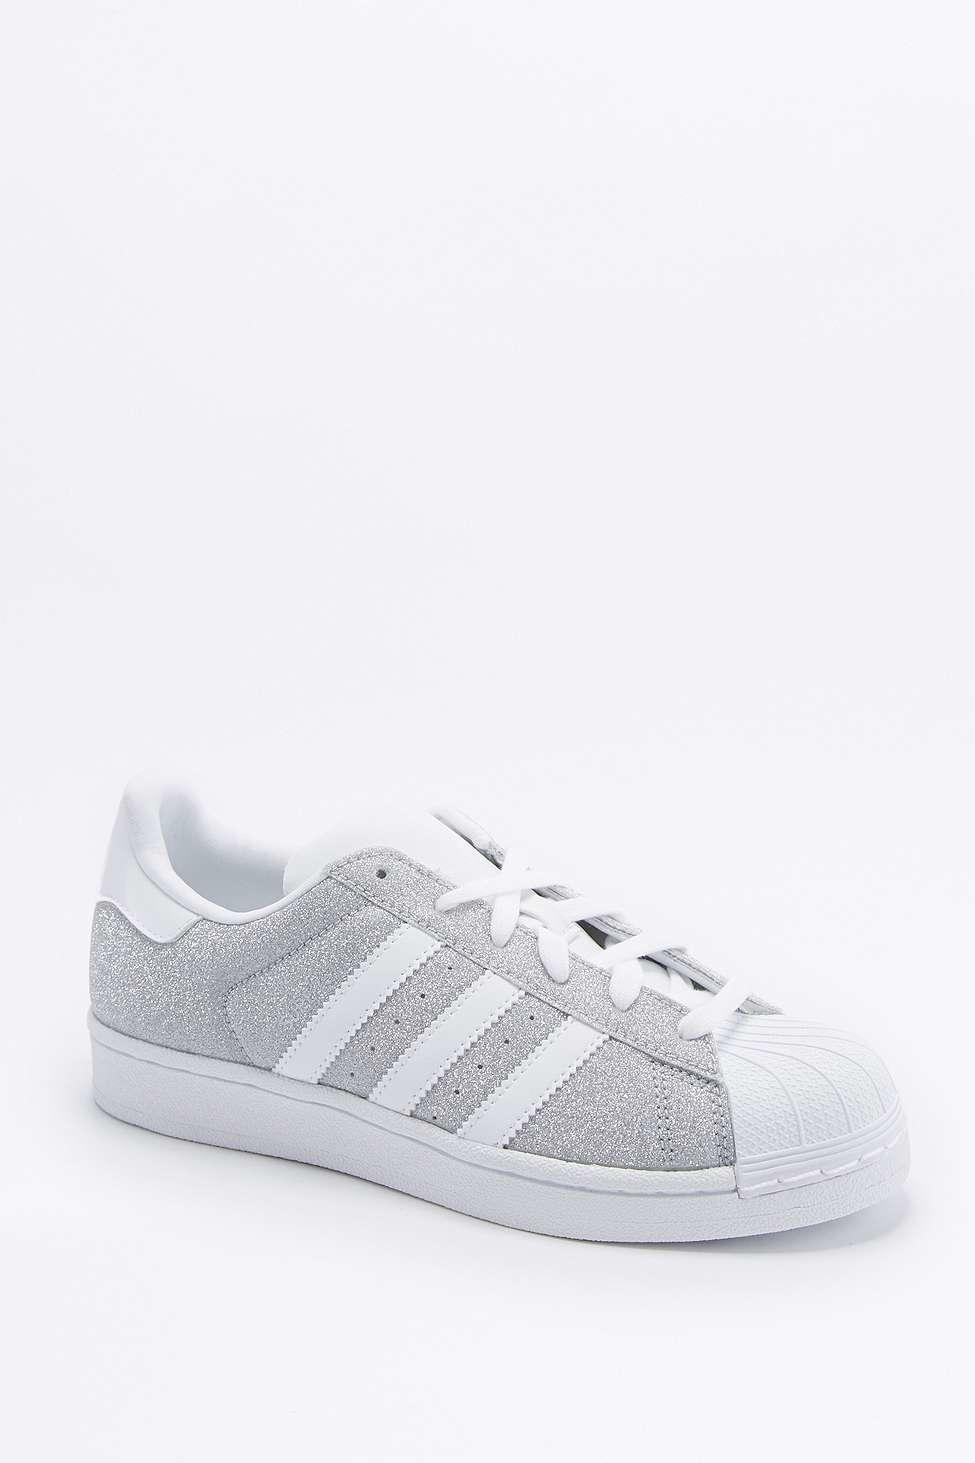 adidas superstar glitter silver stripes trainers toe